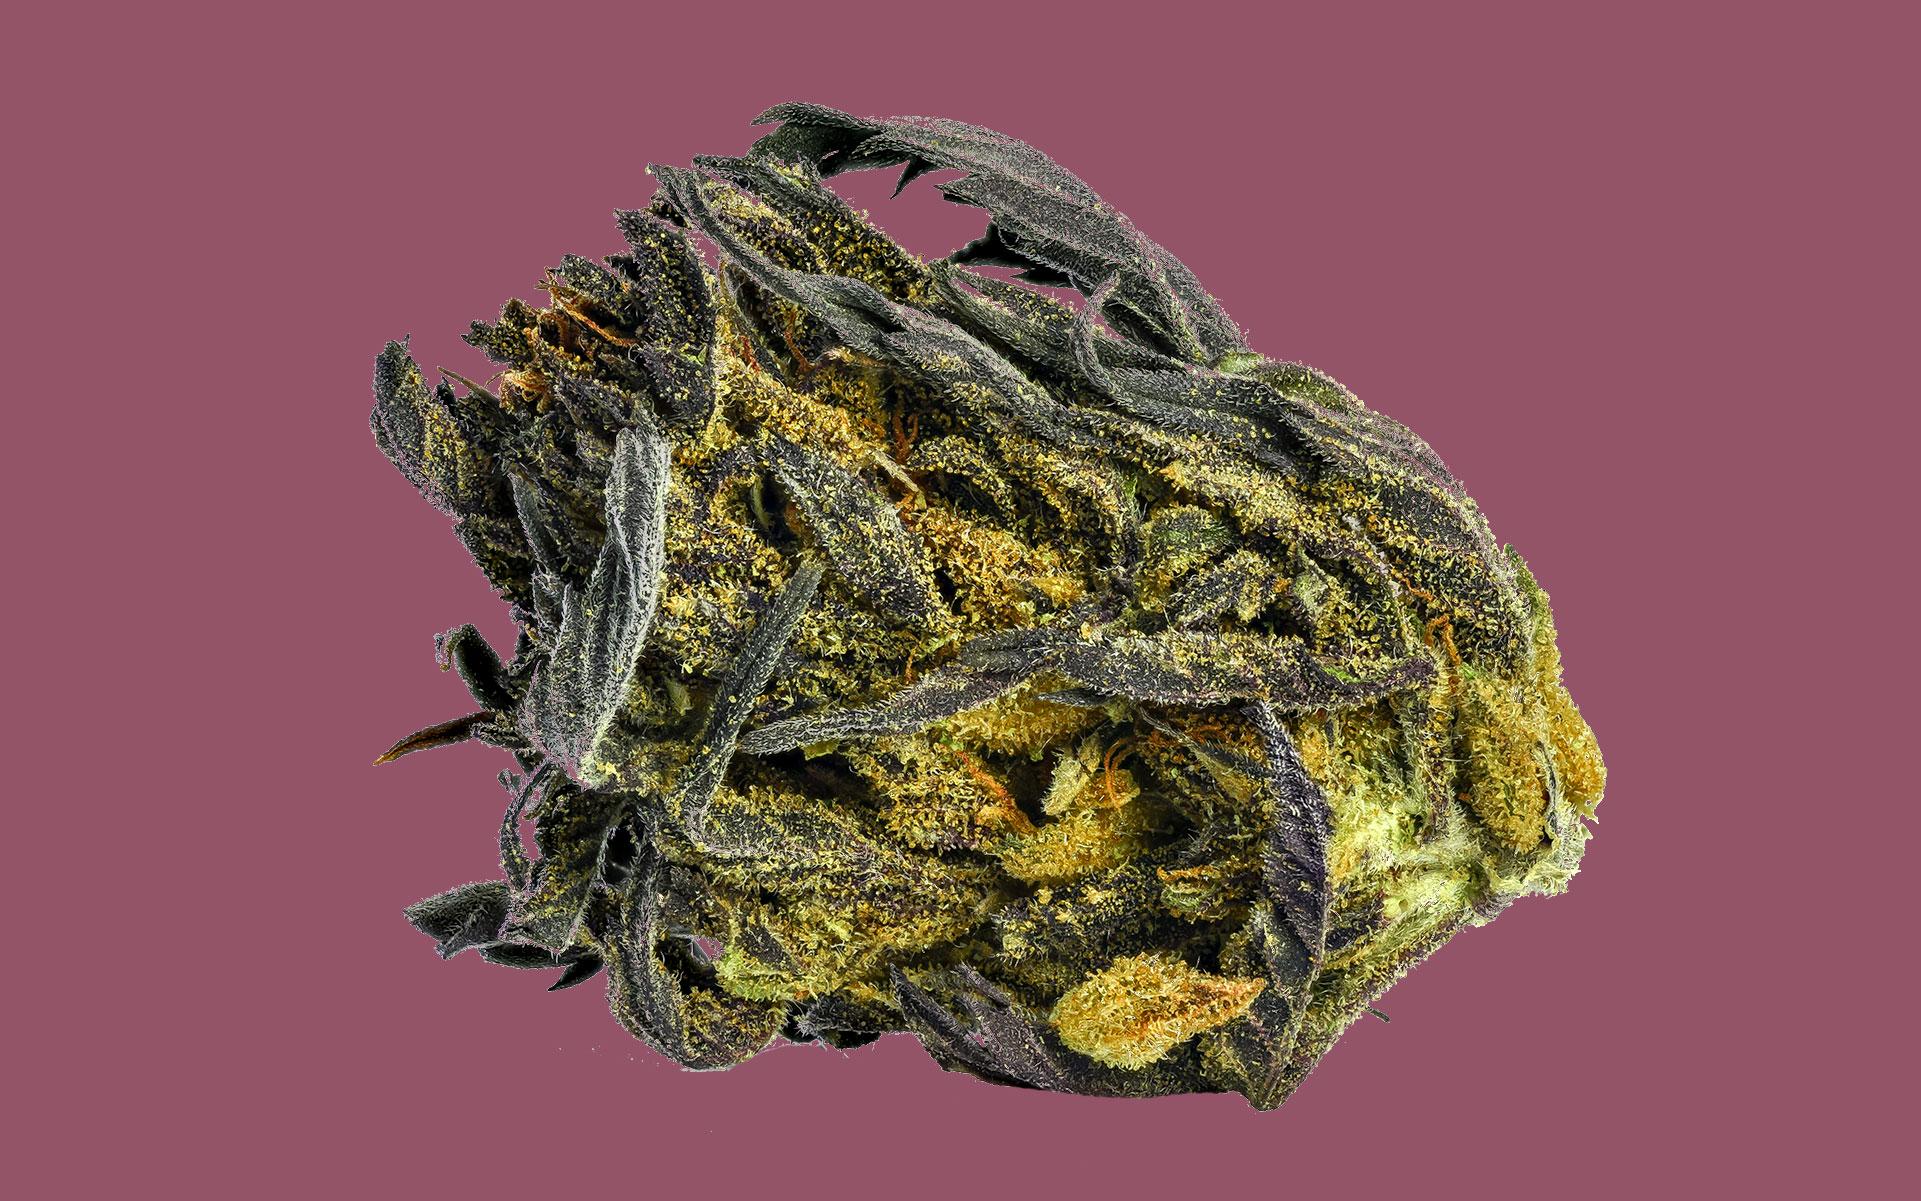 Hemp & CBD Uses, Benefits & Impact ...coloradocannabistours.com